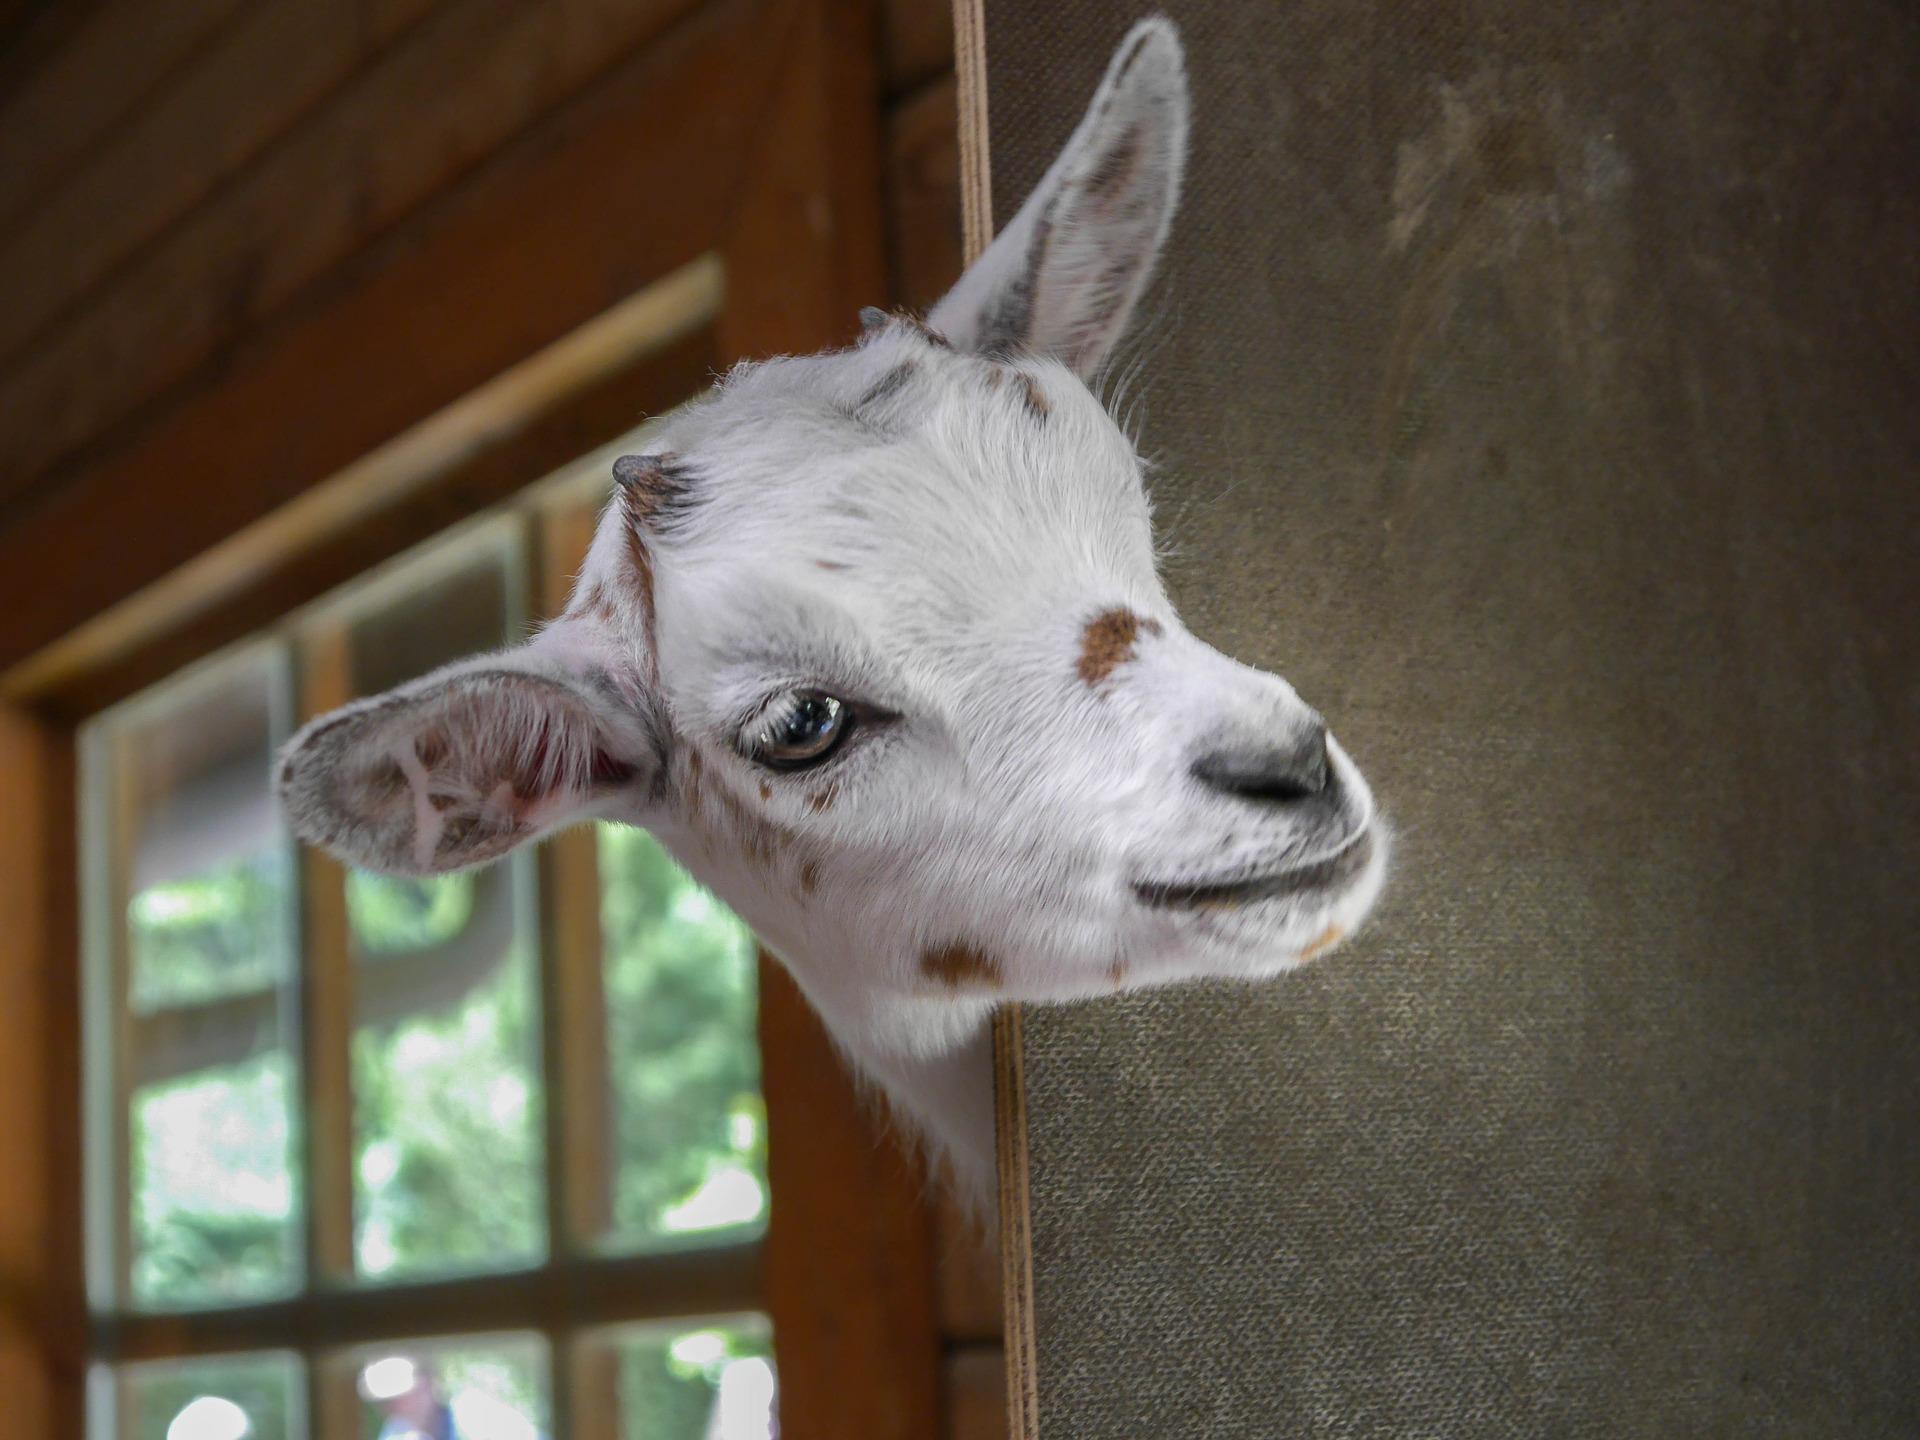 goat 2153622 1920